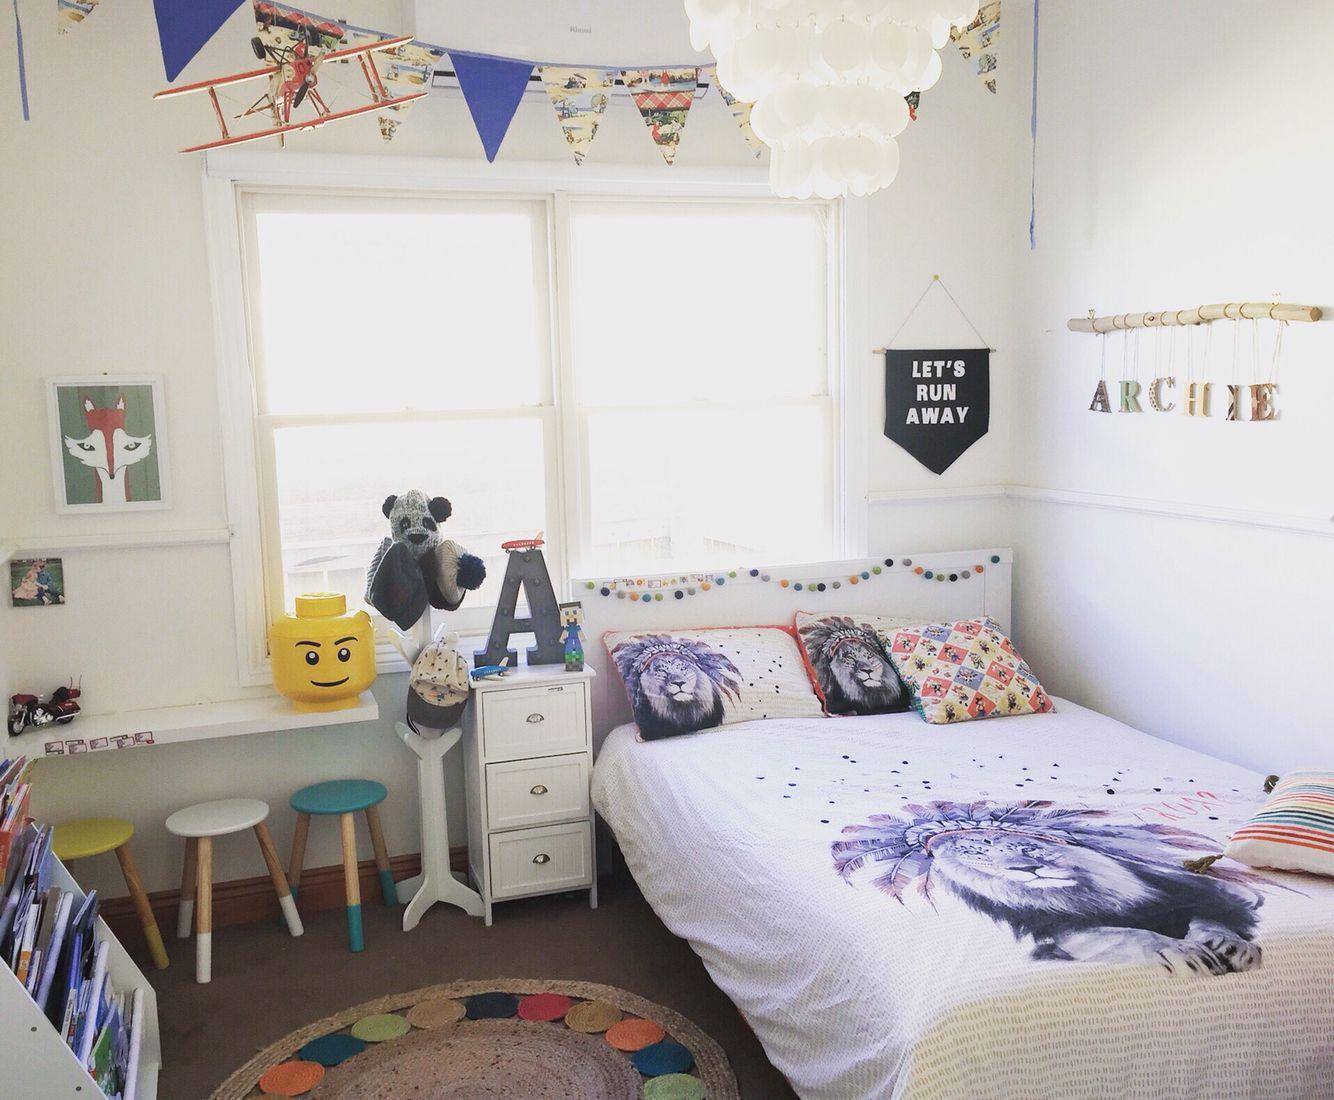 Boys room. Kids room. Adairs. Kmart. Colour